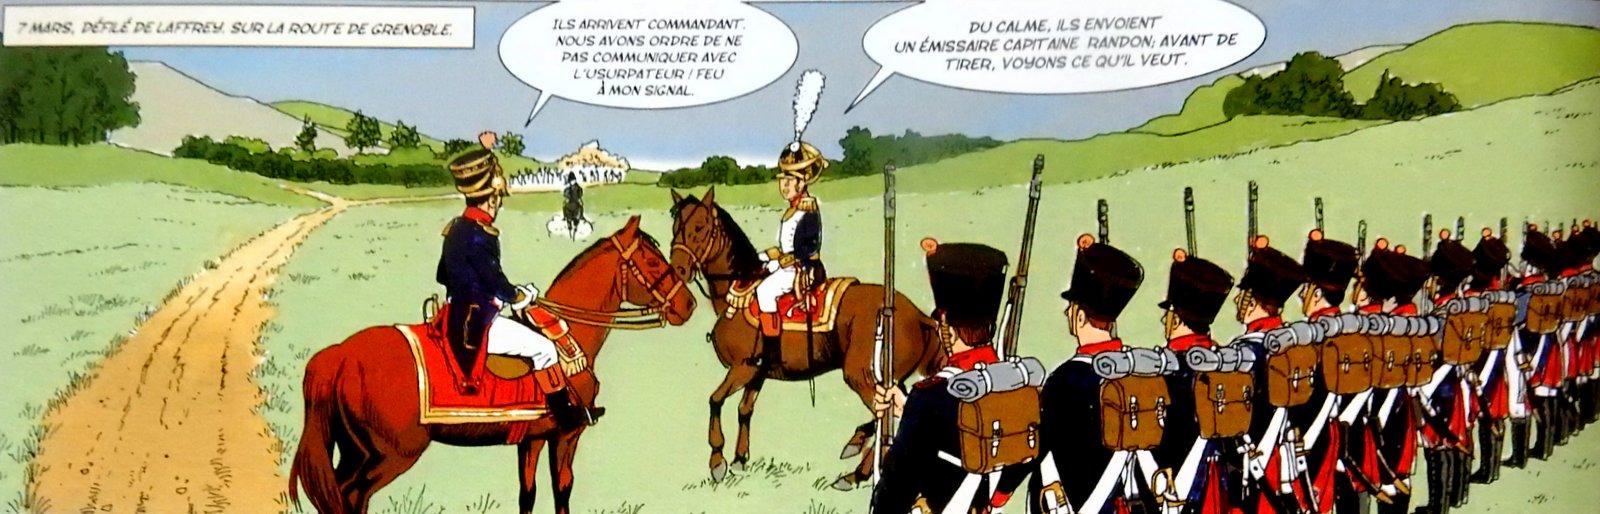 Napoléon Bonaparte - Tome 4 - Pascal Davoz - Jean Torton - Extraits (2)